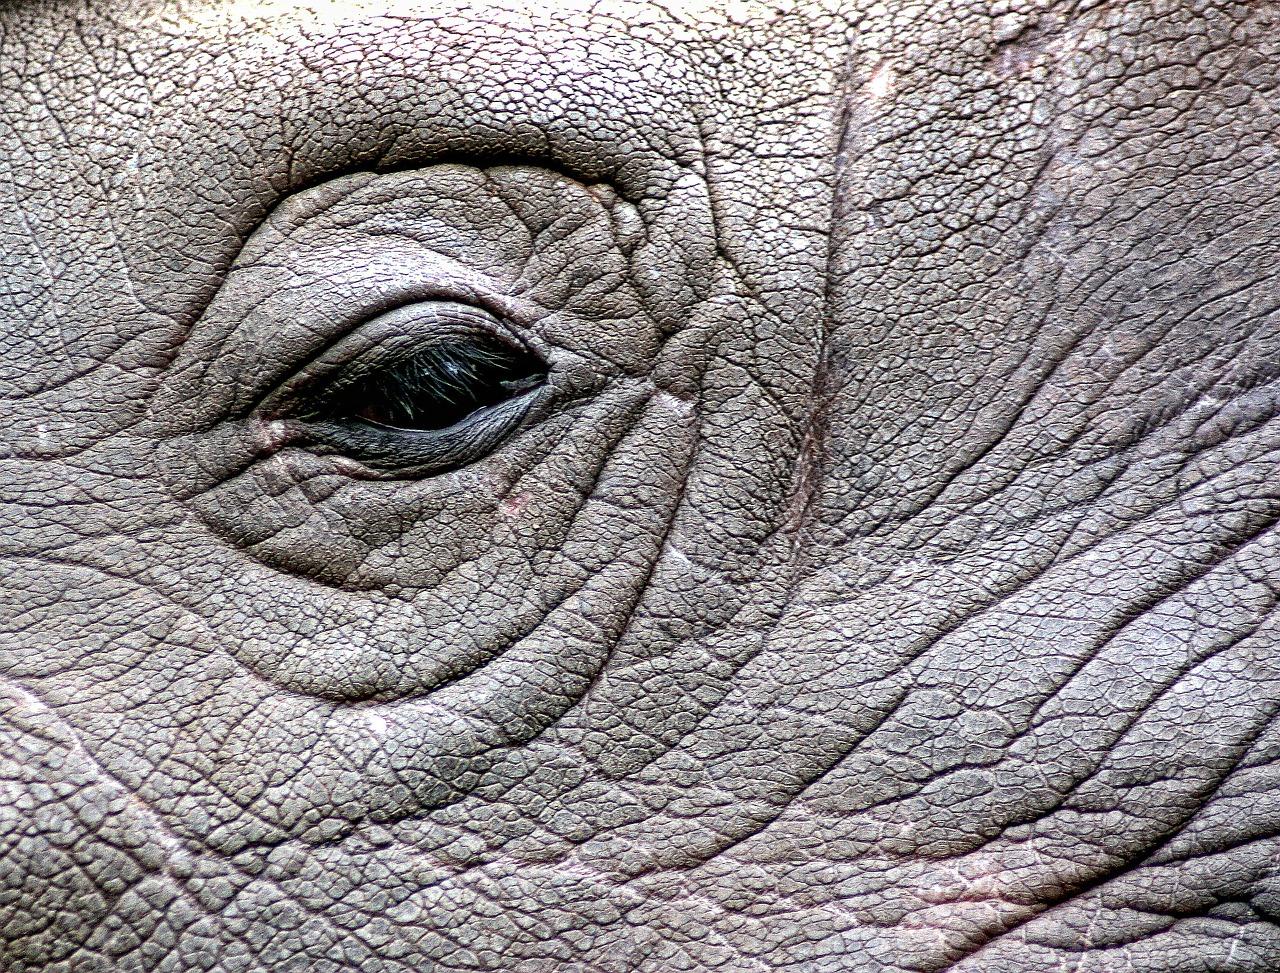 rhinoceros-448949_1280.jpg